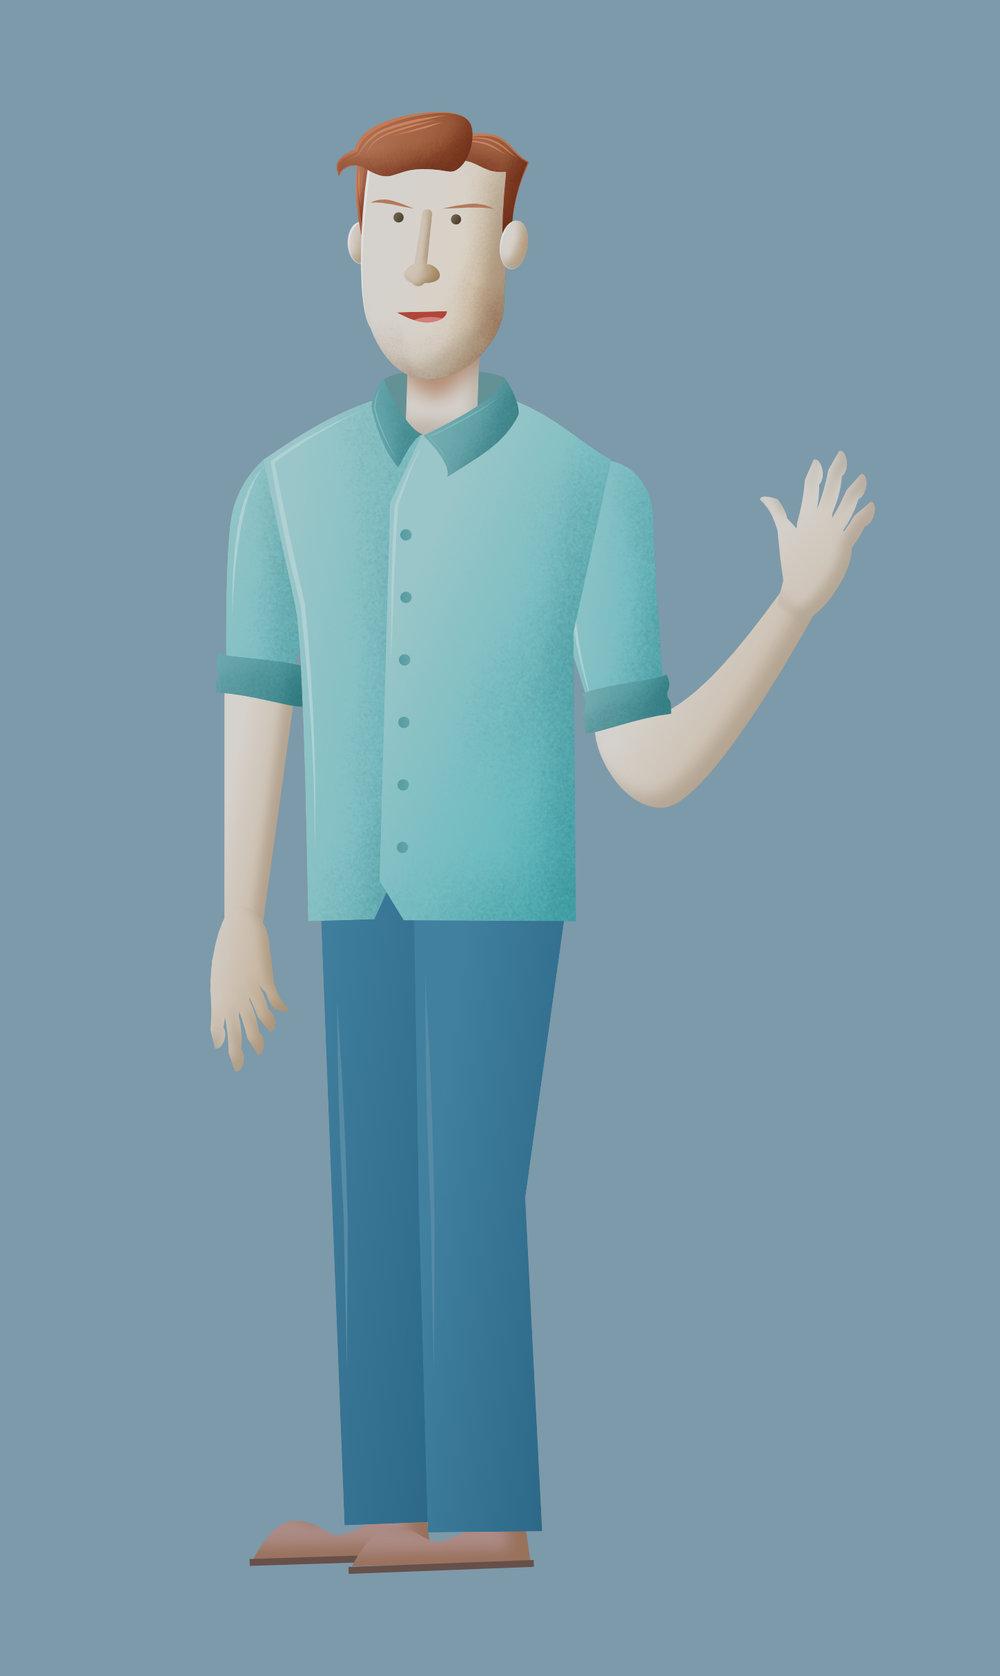 character design_ginger man hello no beard.jpg